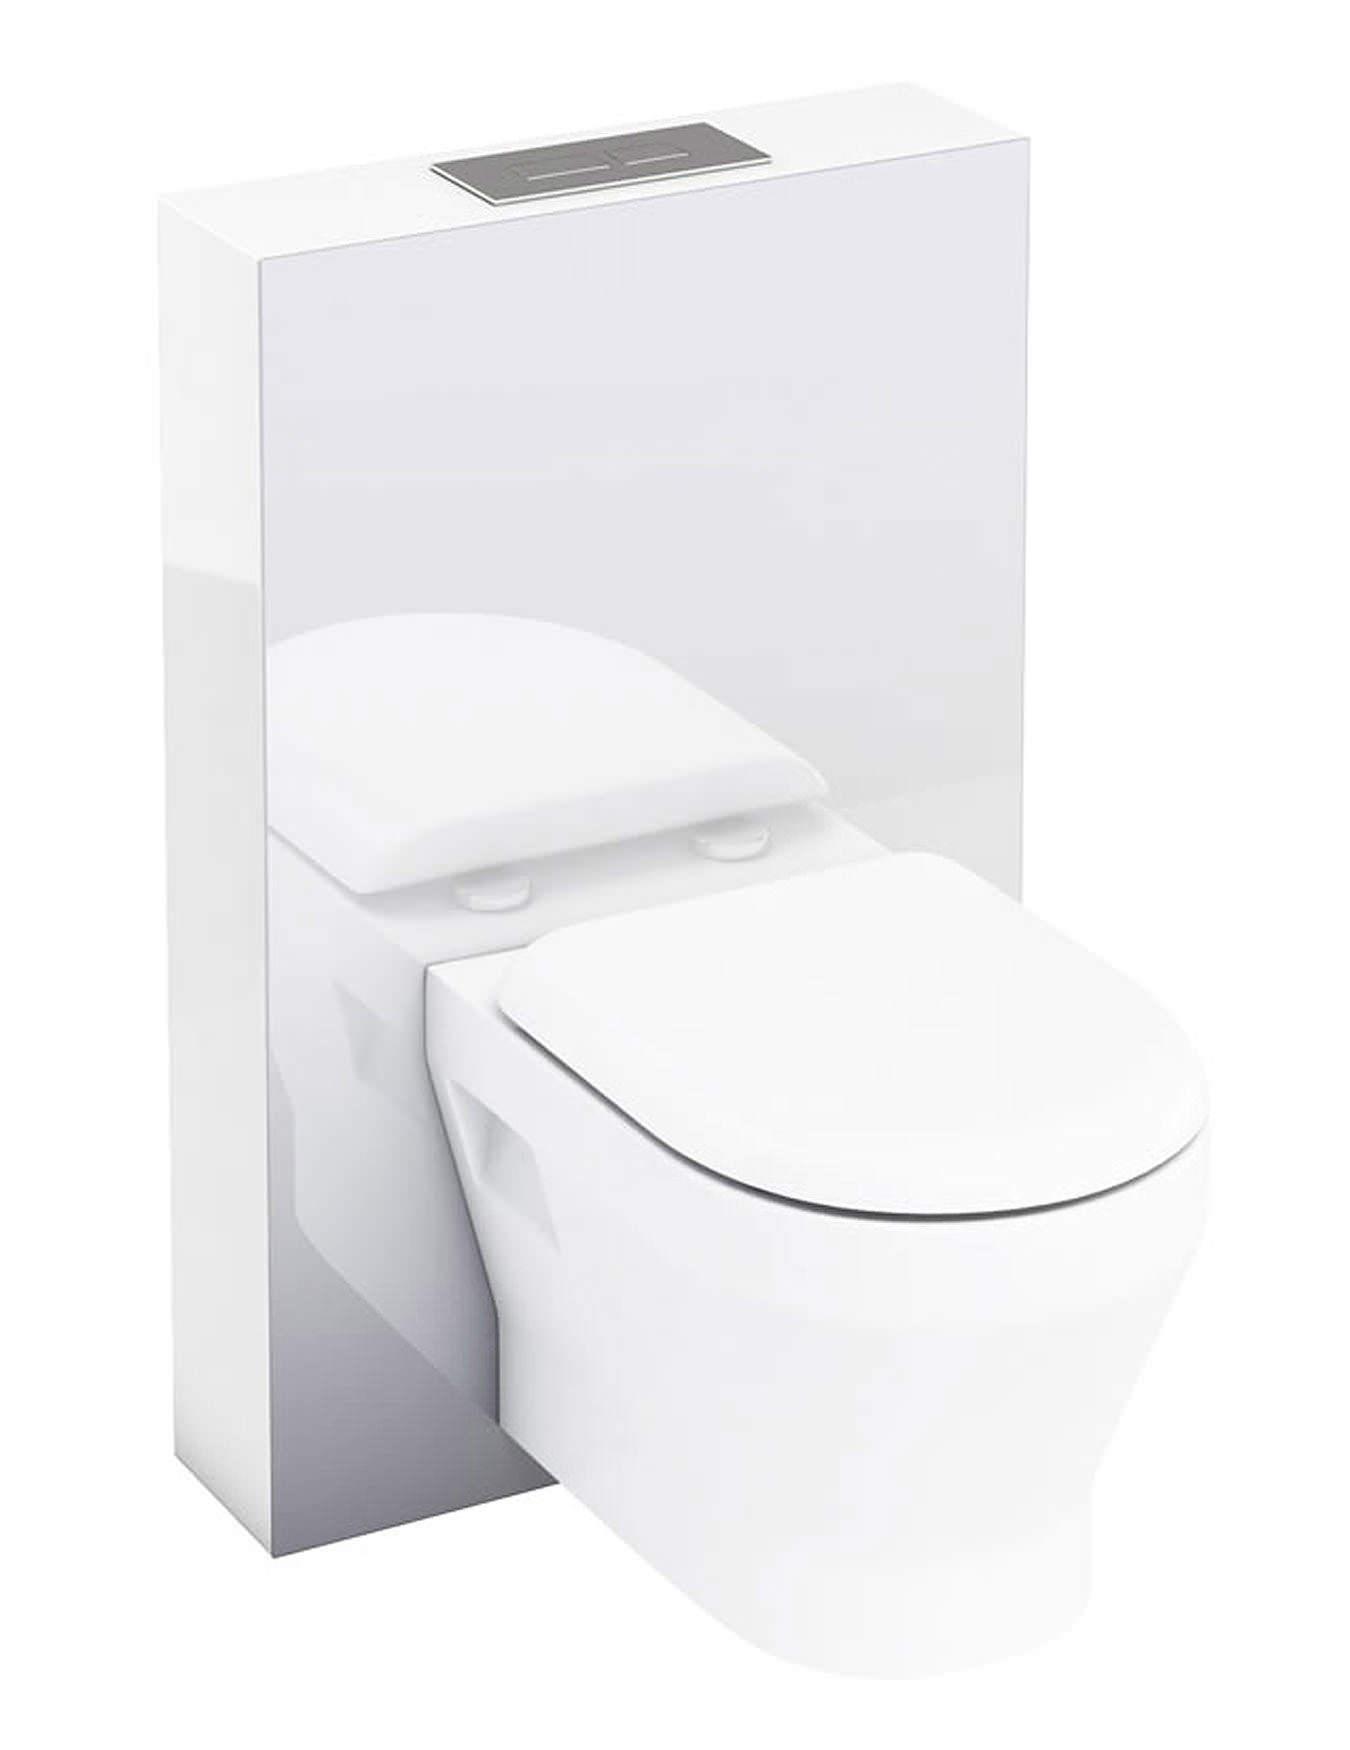 britton aqua cabinets tablet 550mm white wall hung wc unit. Black Bedroom Furniture Sets. Home Design Ideas